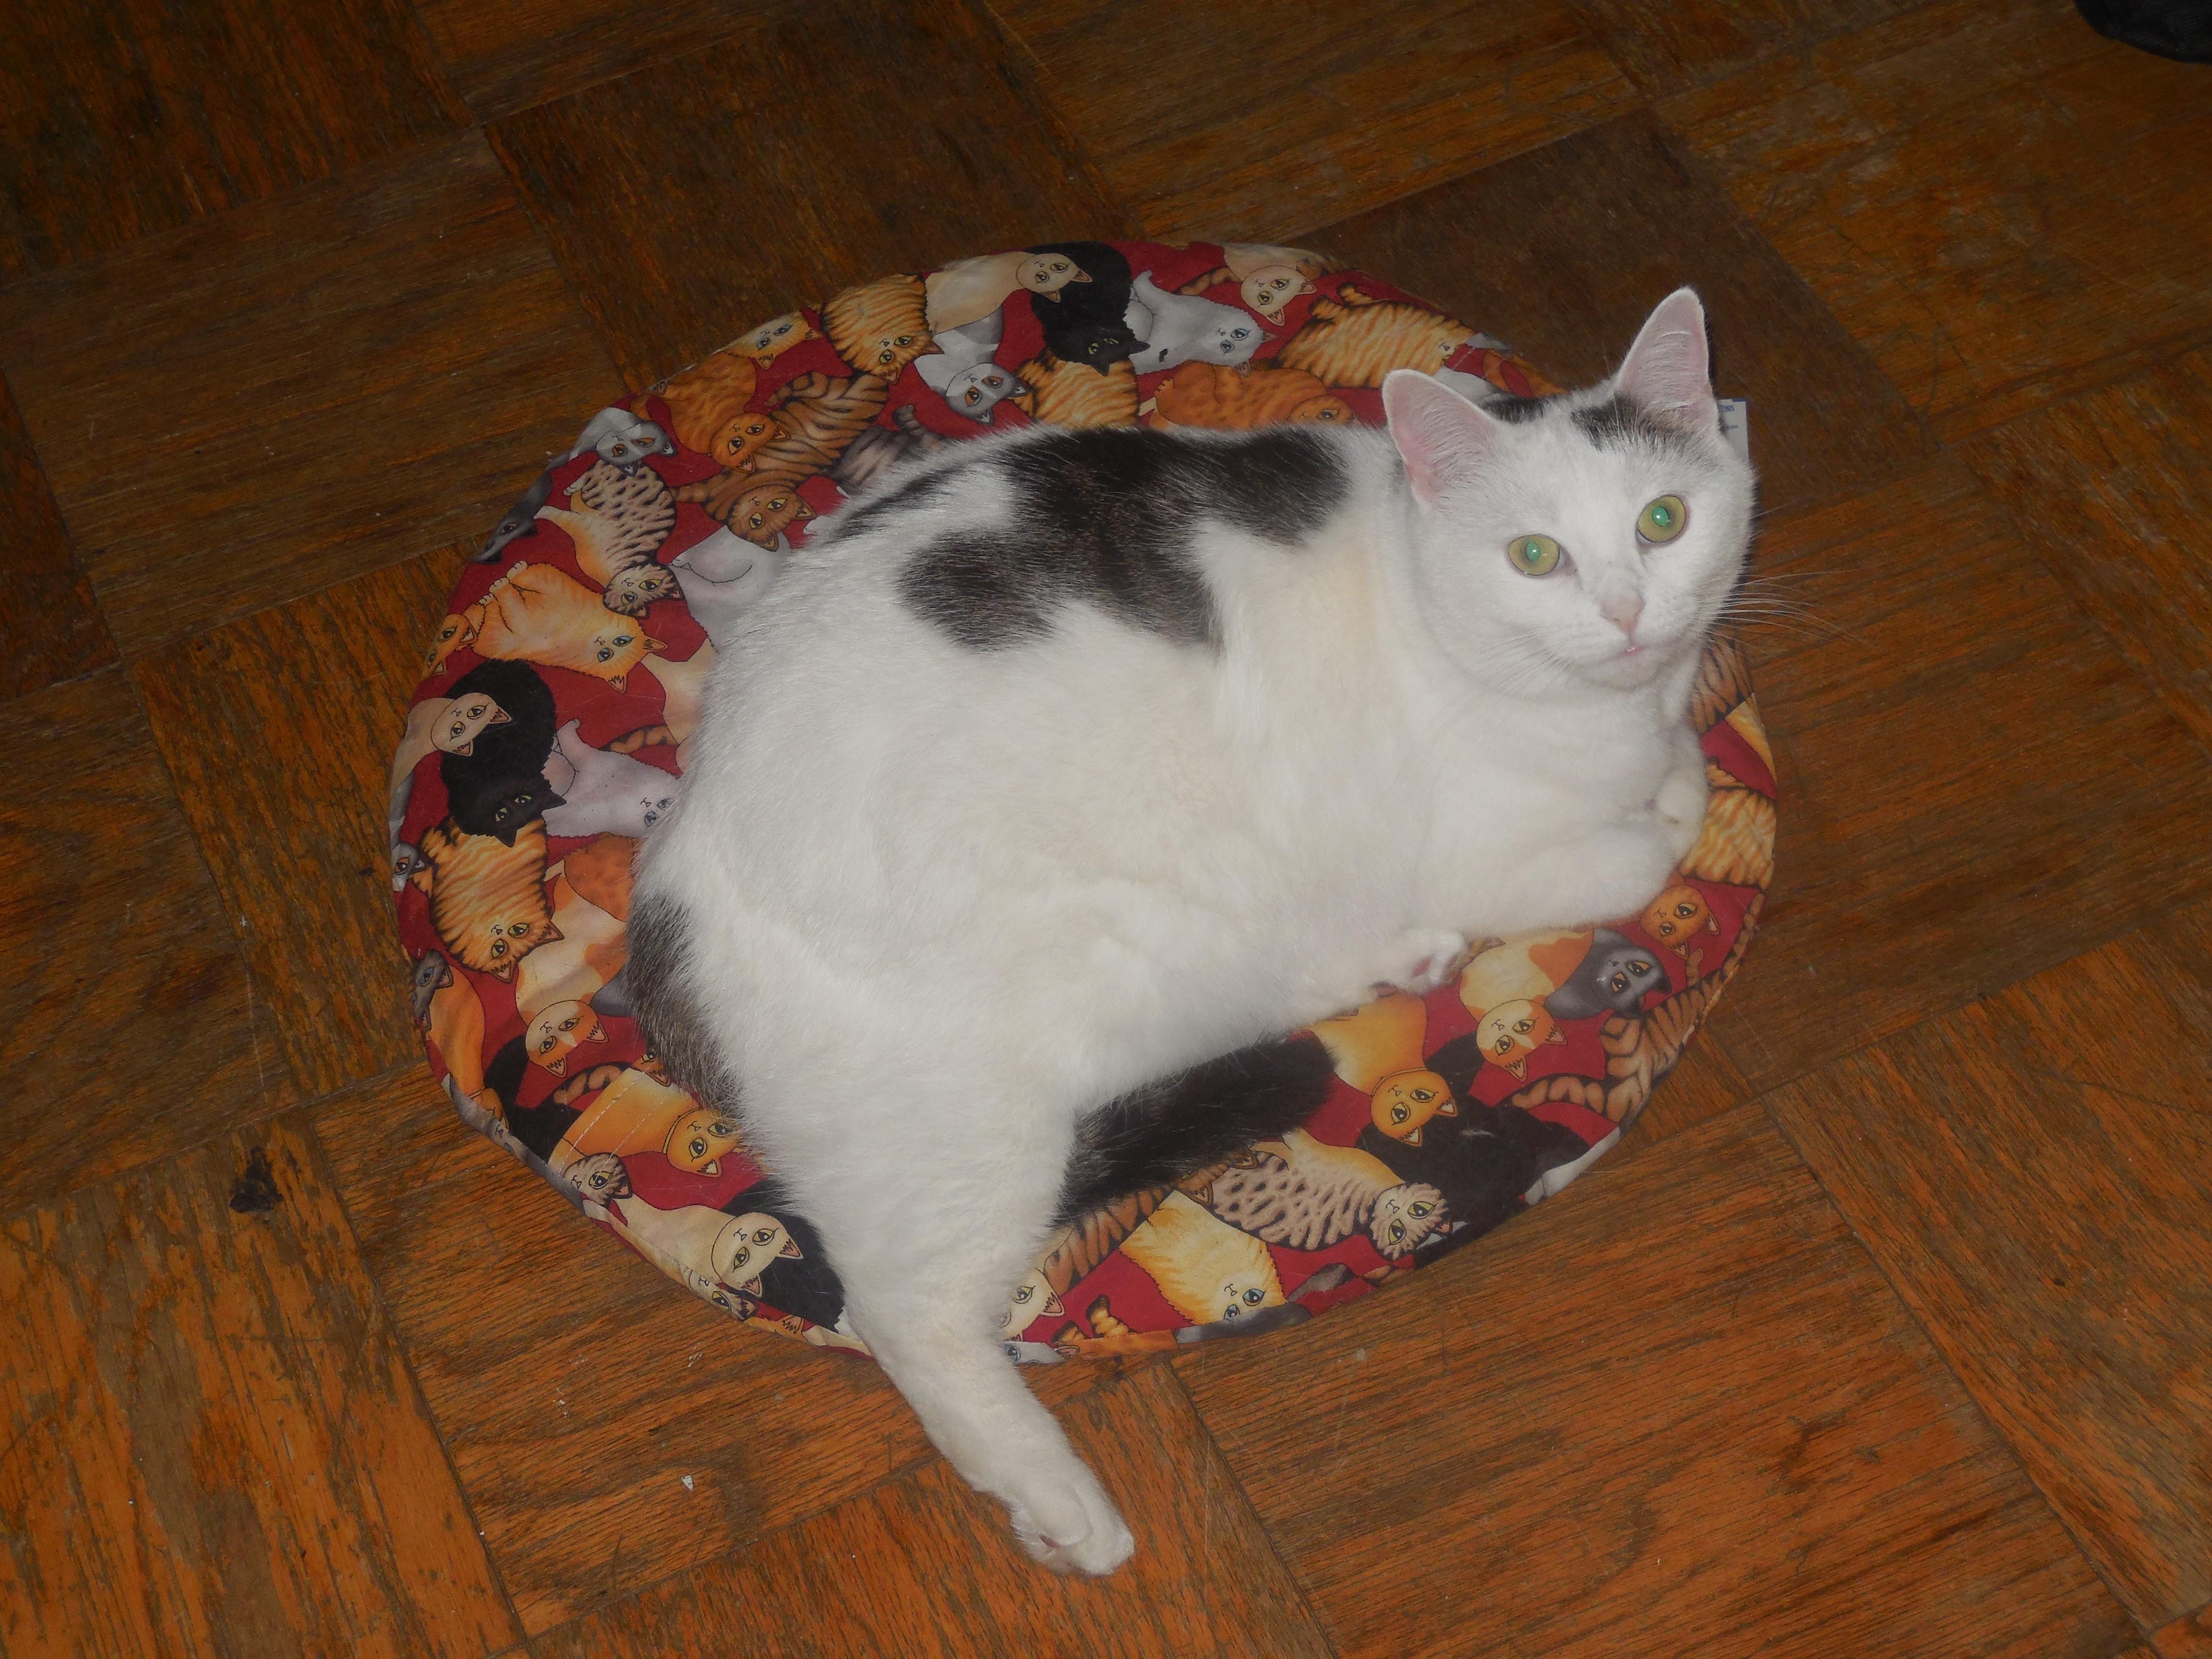 Is Bonnie A Turkish Van A Regular White Cat With A Few Black Spots Or Part Turkish Van Http Ift Tt 2pq5tou White Cat Turkish Van Cats